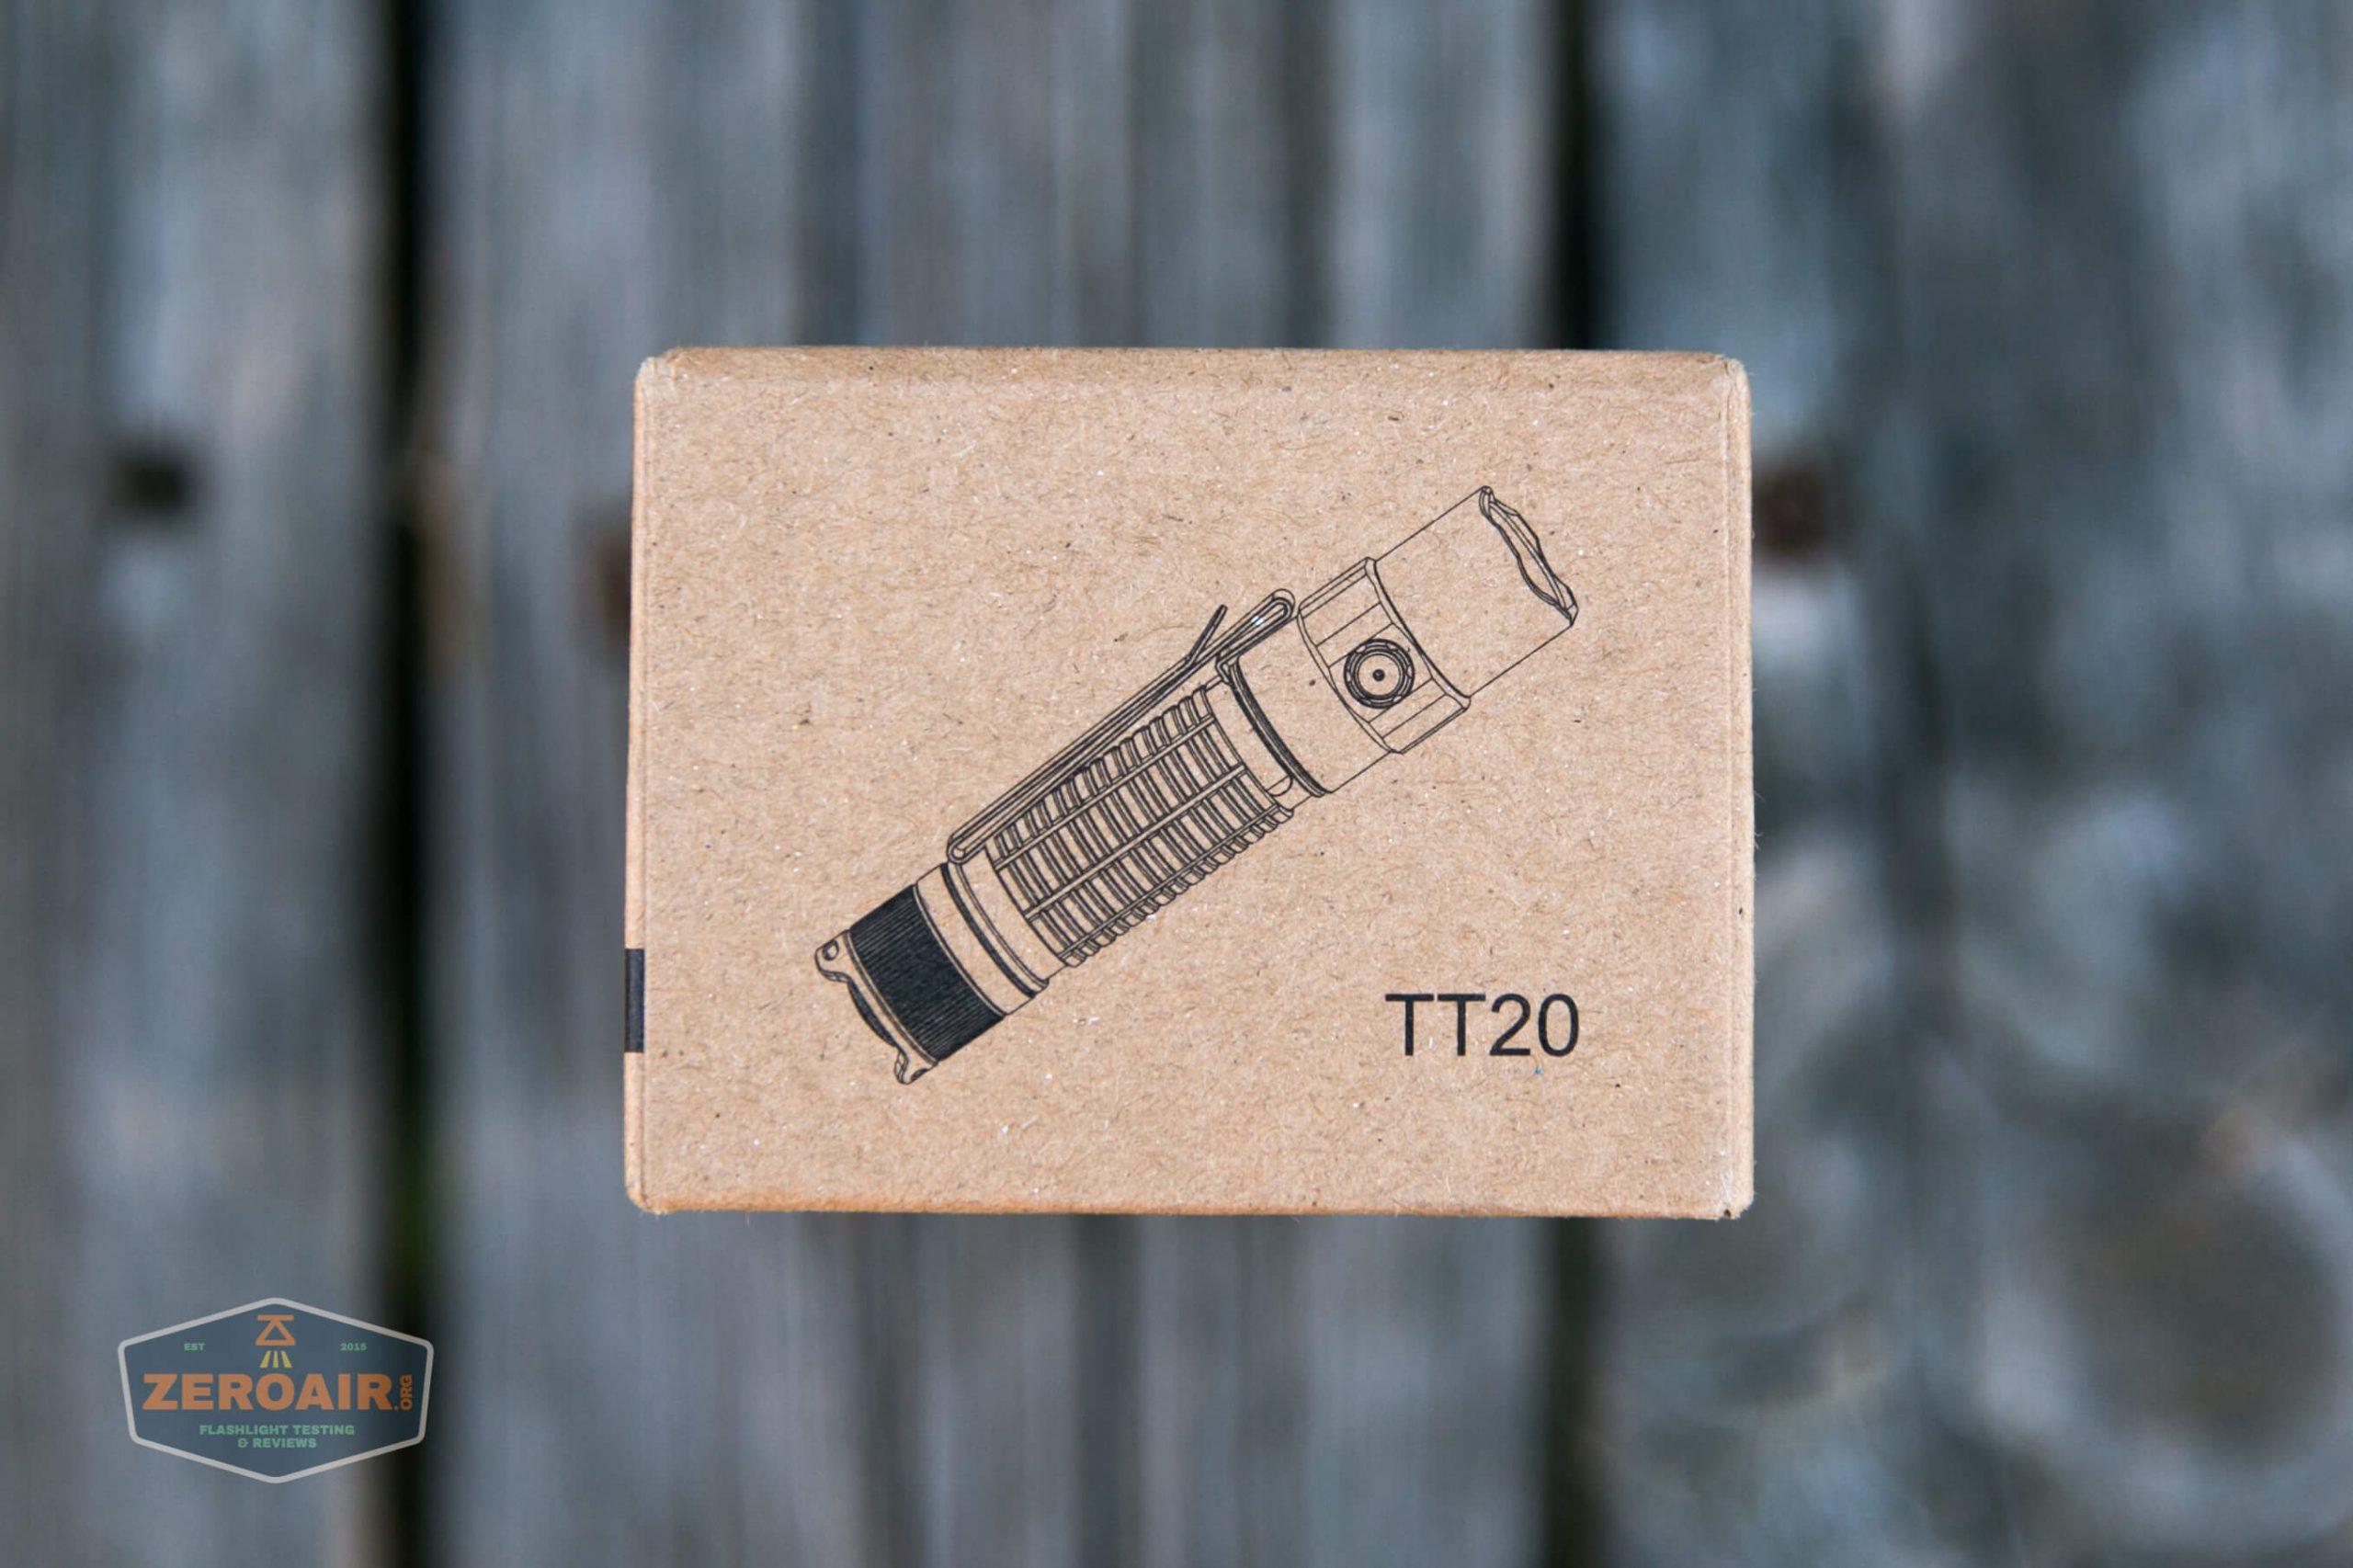 thrunite tt20 the outsider red 21700 flashlight box